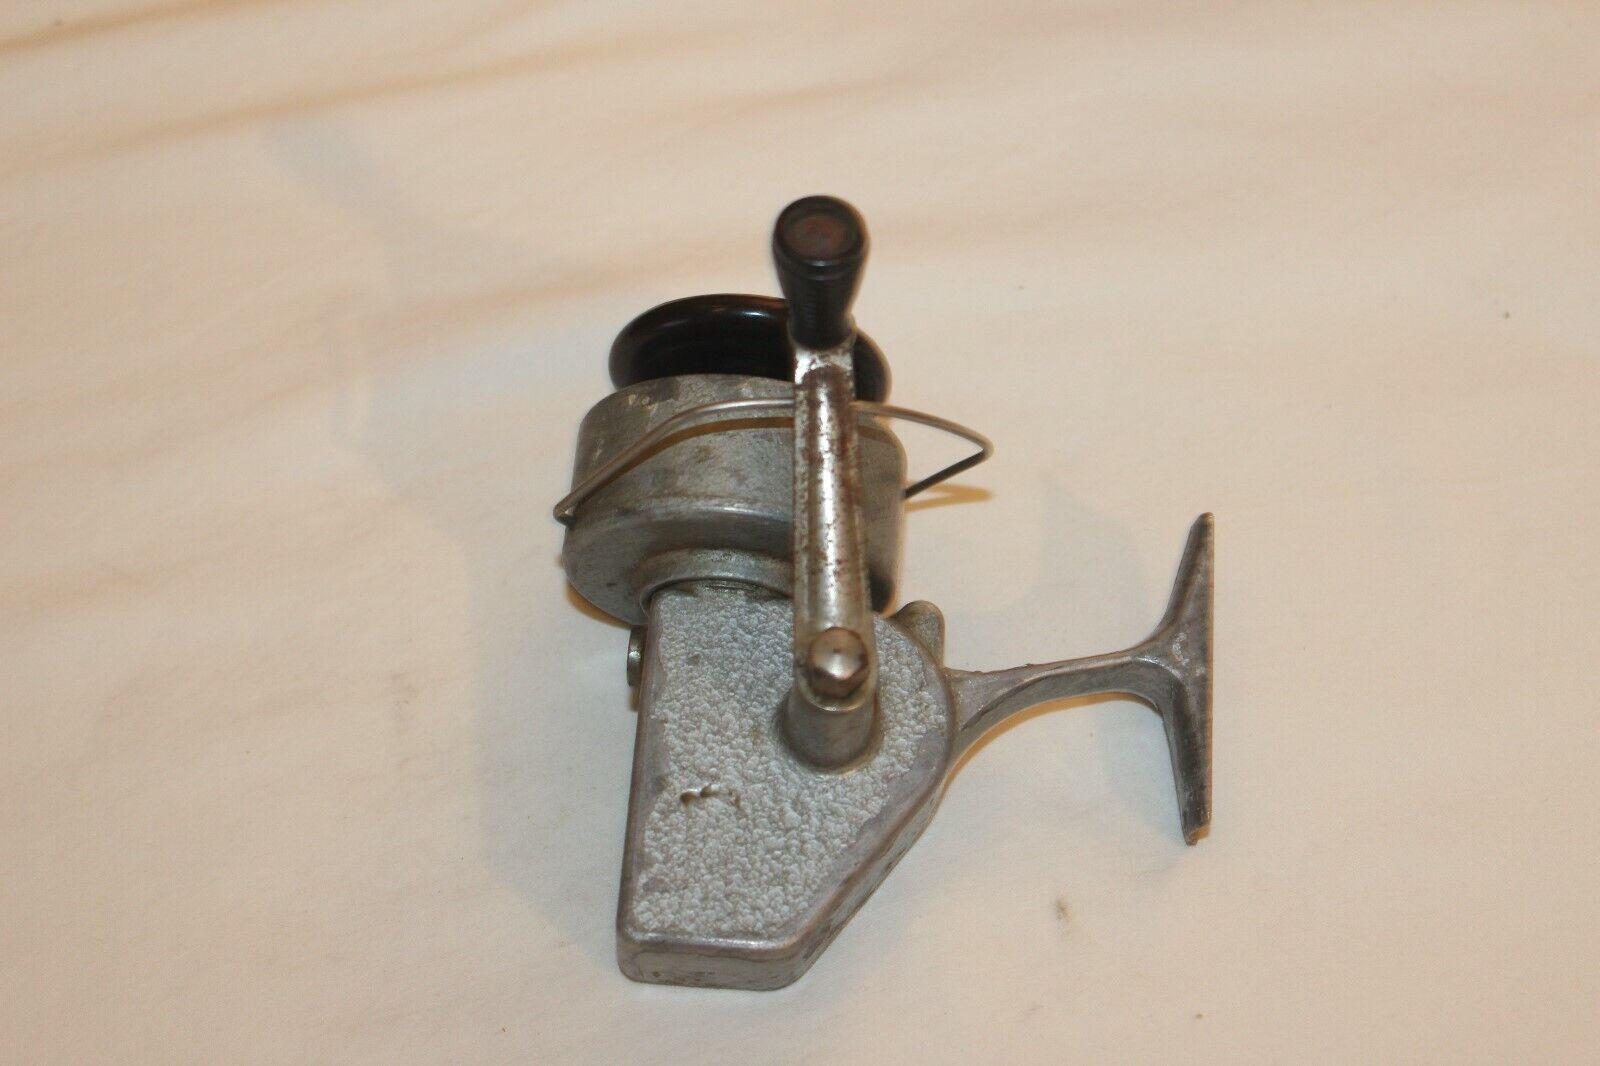 DDR papel  flecha  - nr-1438 nr-1438 nr-1438 be4ade